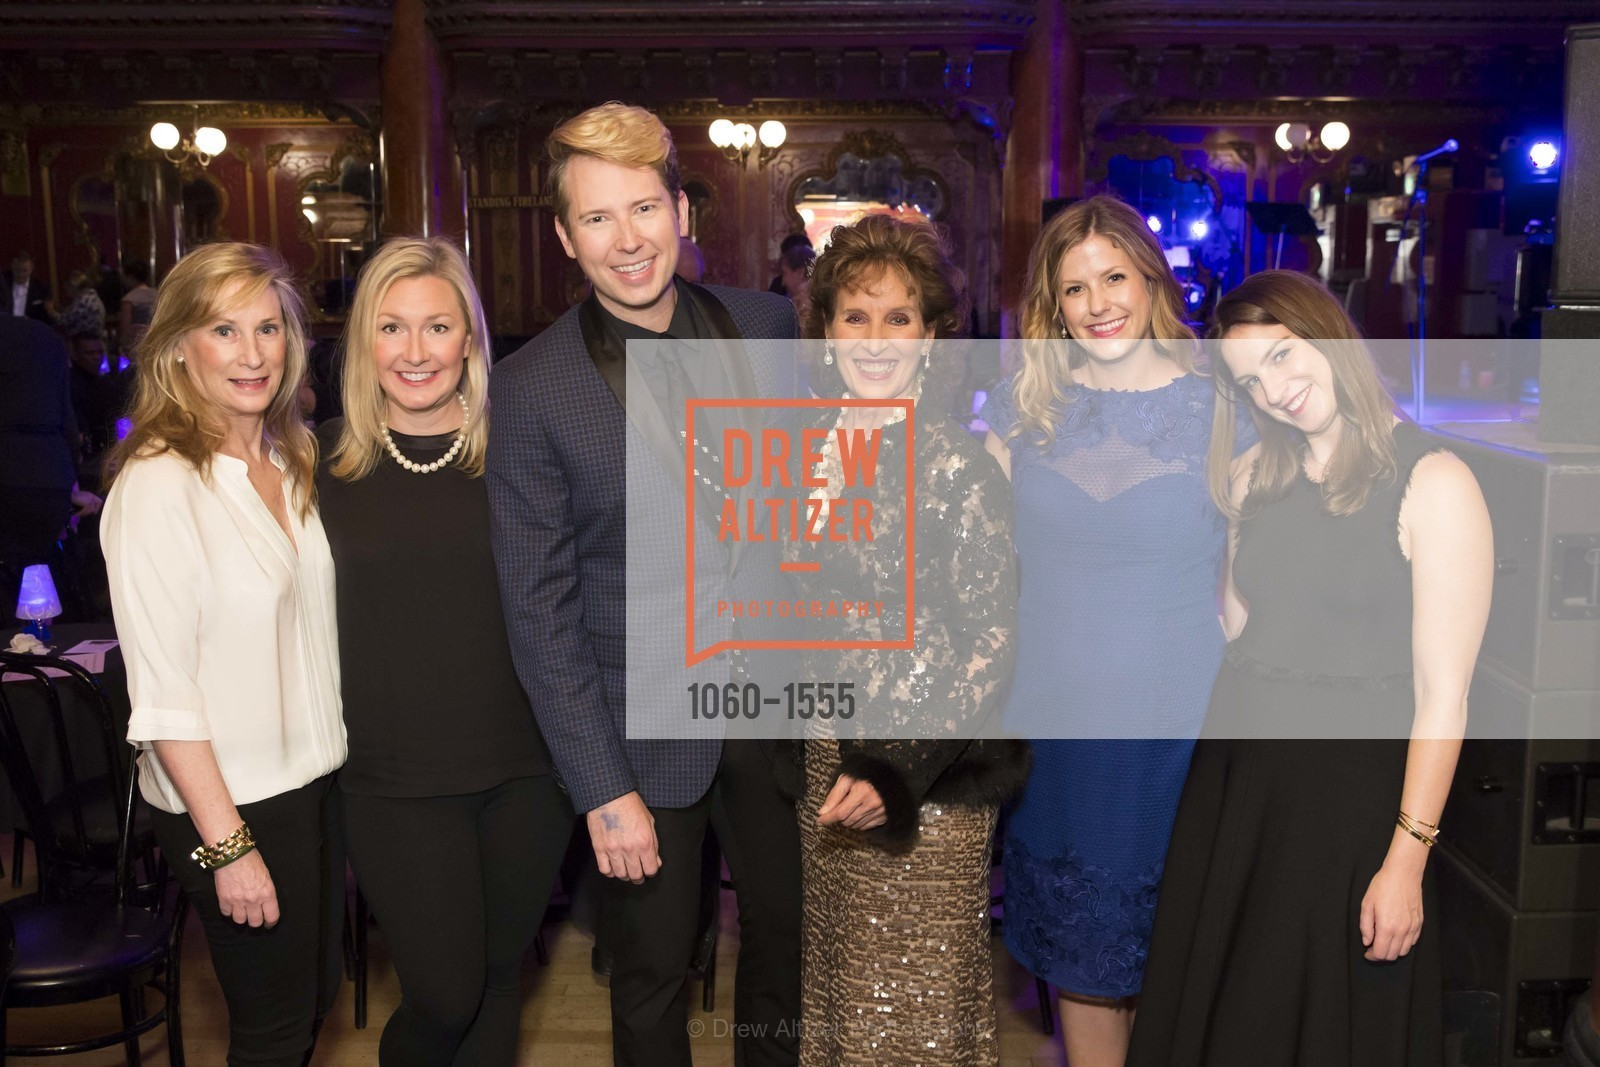 Sara Duryea, Kelsey Phelps Finch, Shawn Ryan, Andrea Marcovicci, Lily Bowles Leo, Kathryn Duryea, Photo #1060-1555